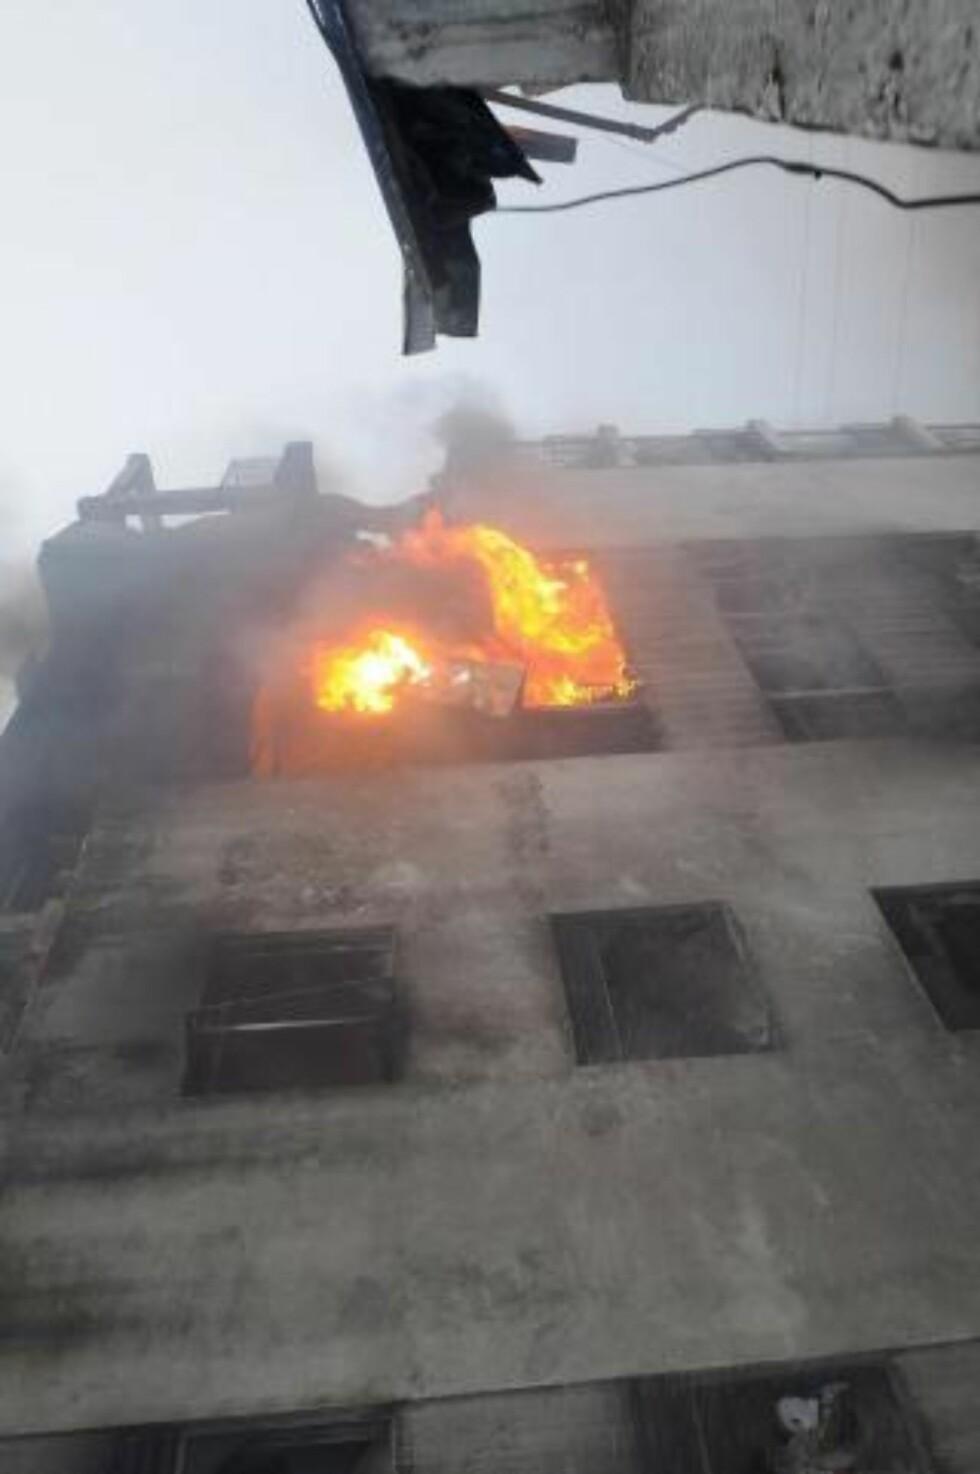 FLAMMER: Flyet krasjet i et høyhus, som tok fyr da flyet styrtet. Foto: Jaime Echeverria/EPA/Scanpix